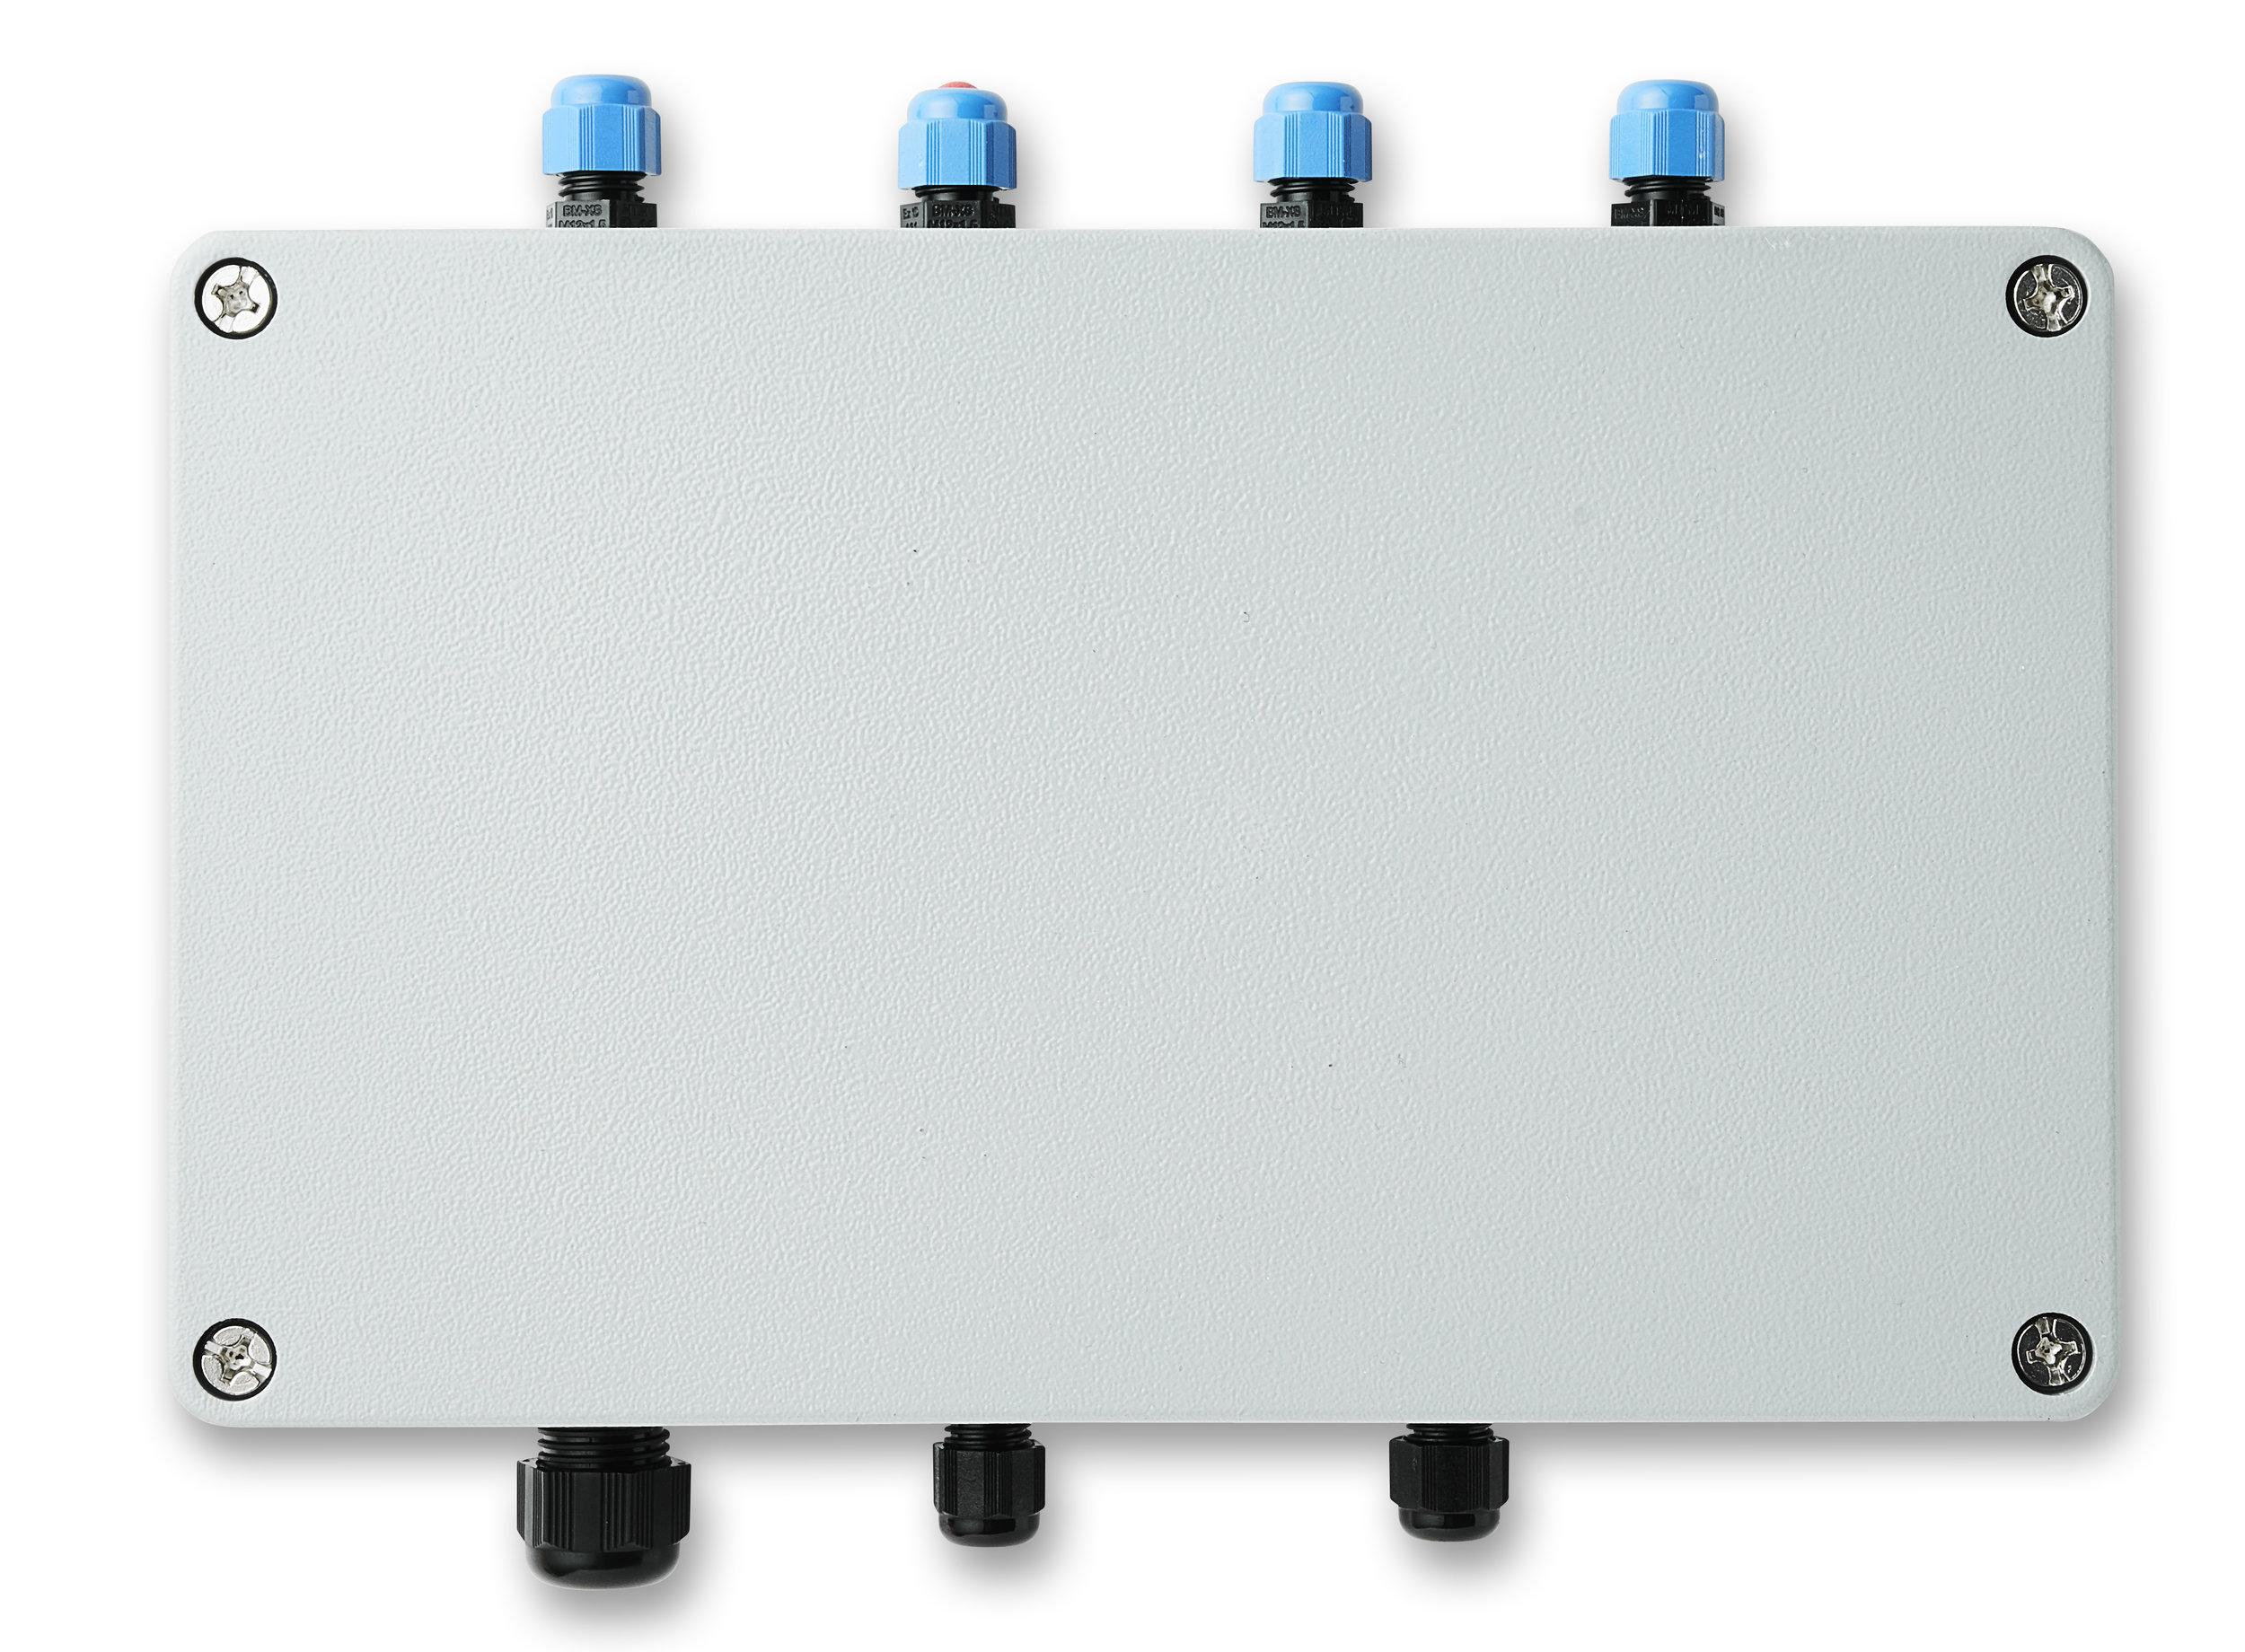 13-netcontroller-1.jpg